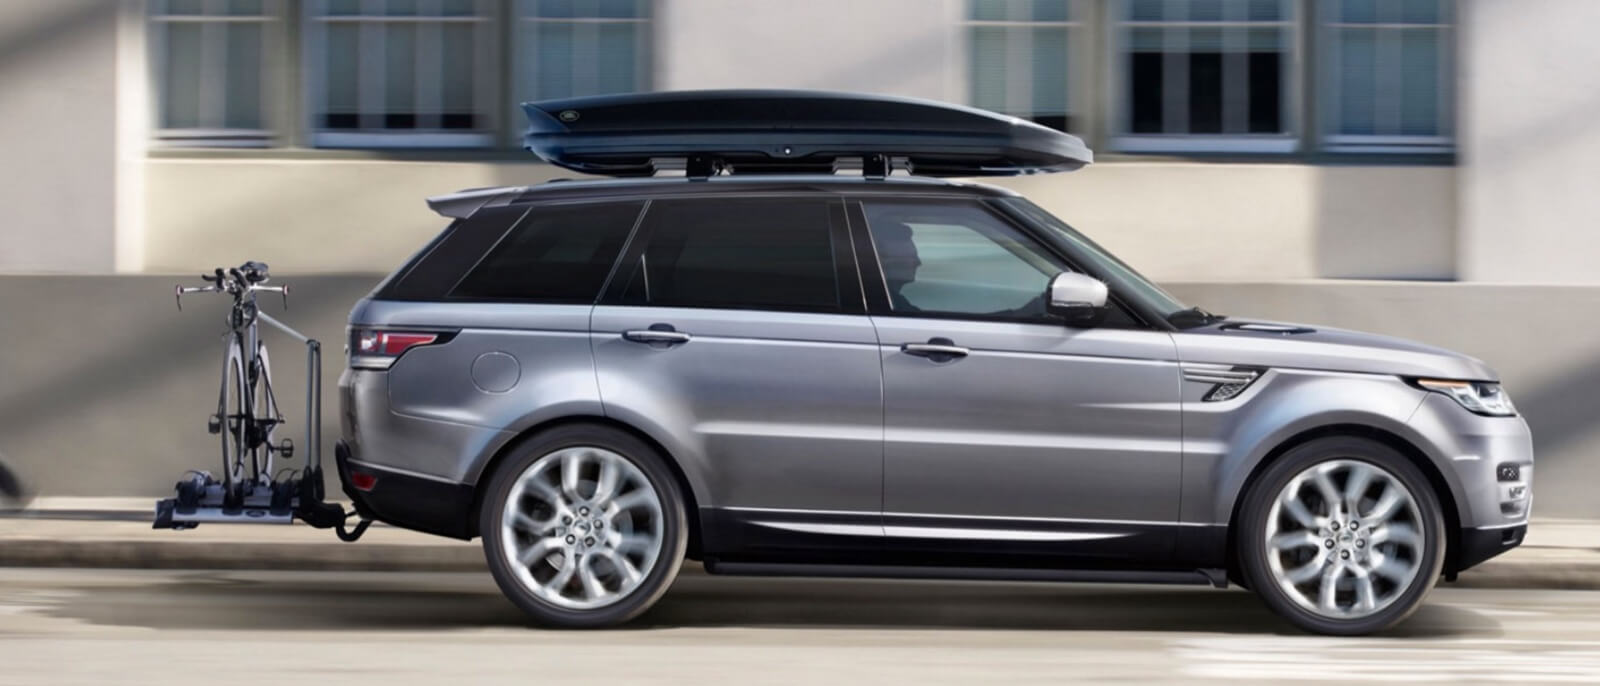 2016 Range Rover Sport profile view